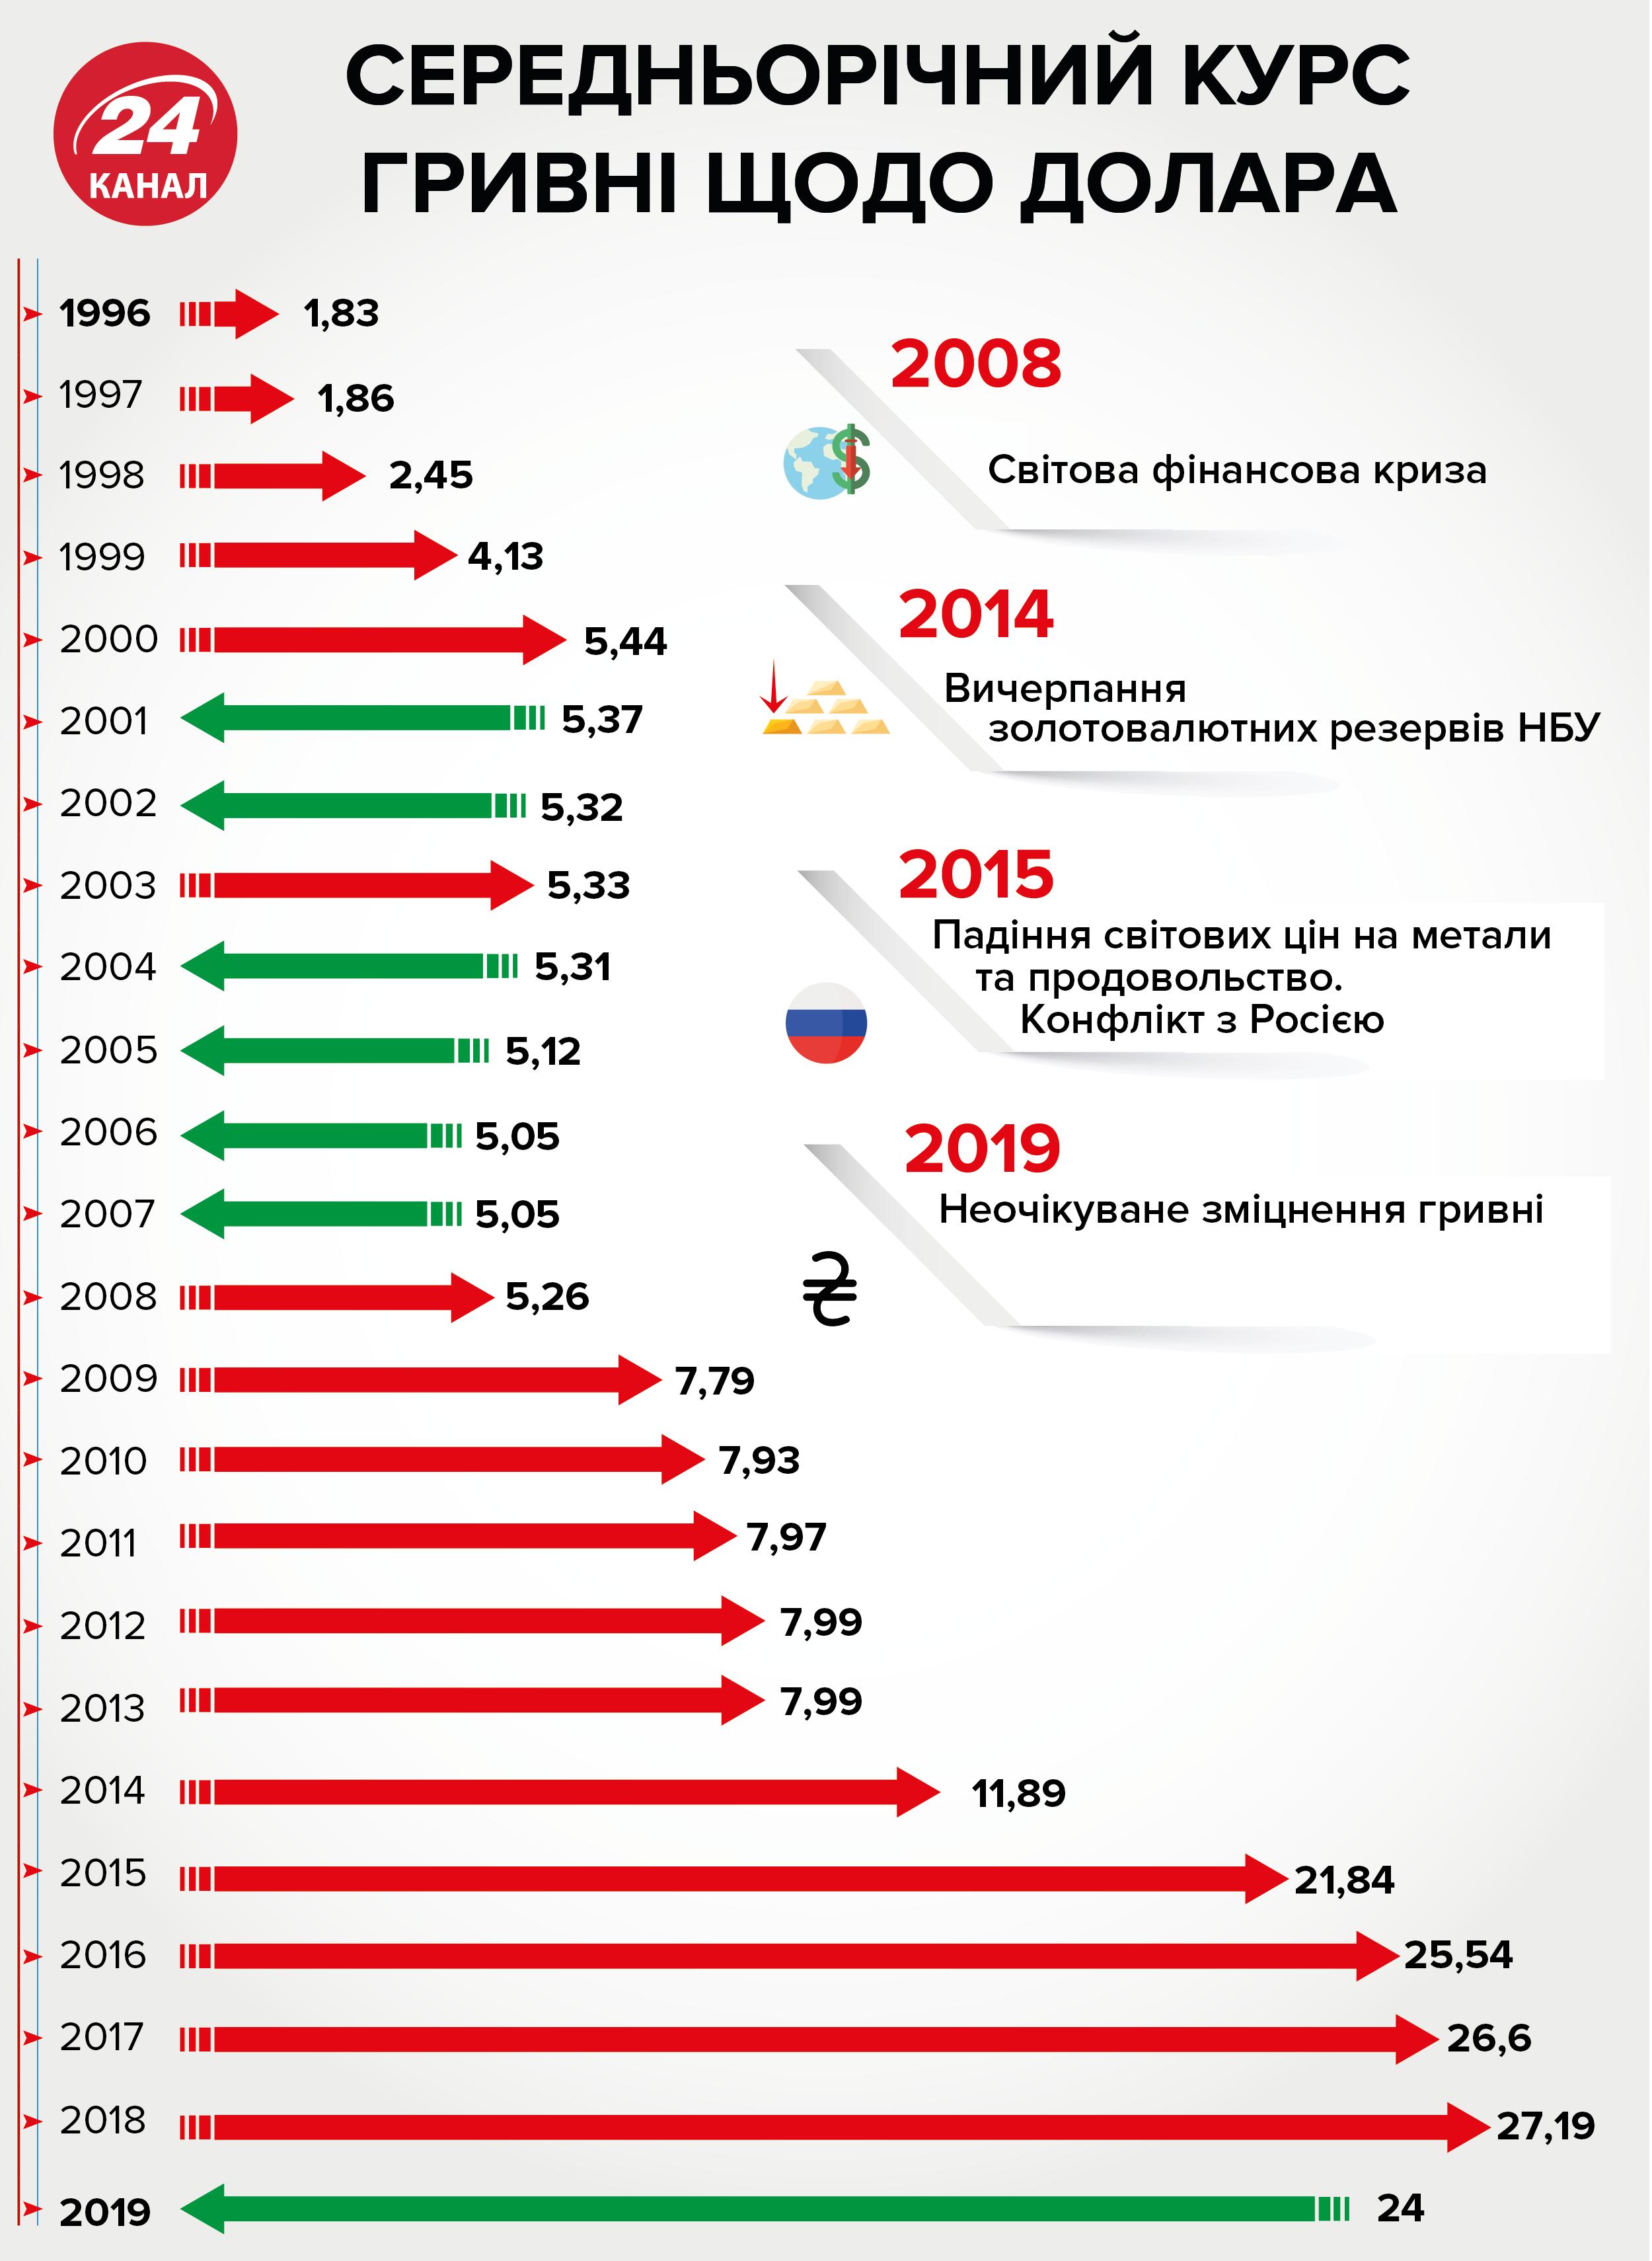 курс валют за незалежної України, курс валют з 1996 по 2019 роки